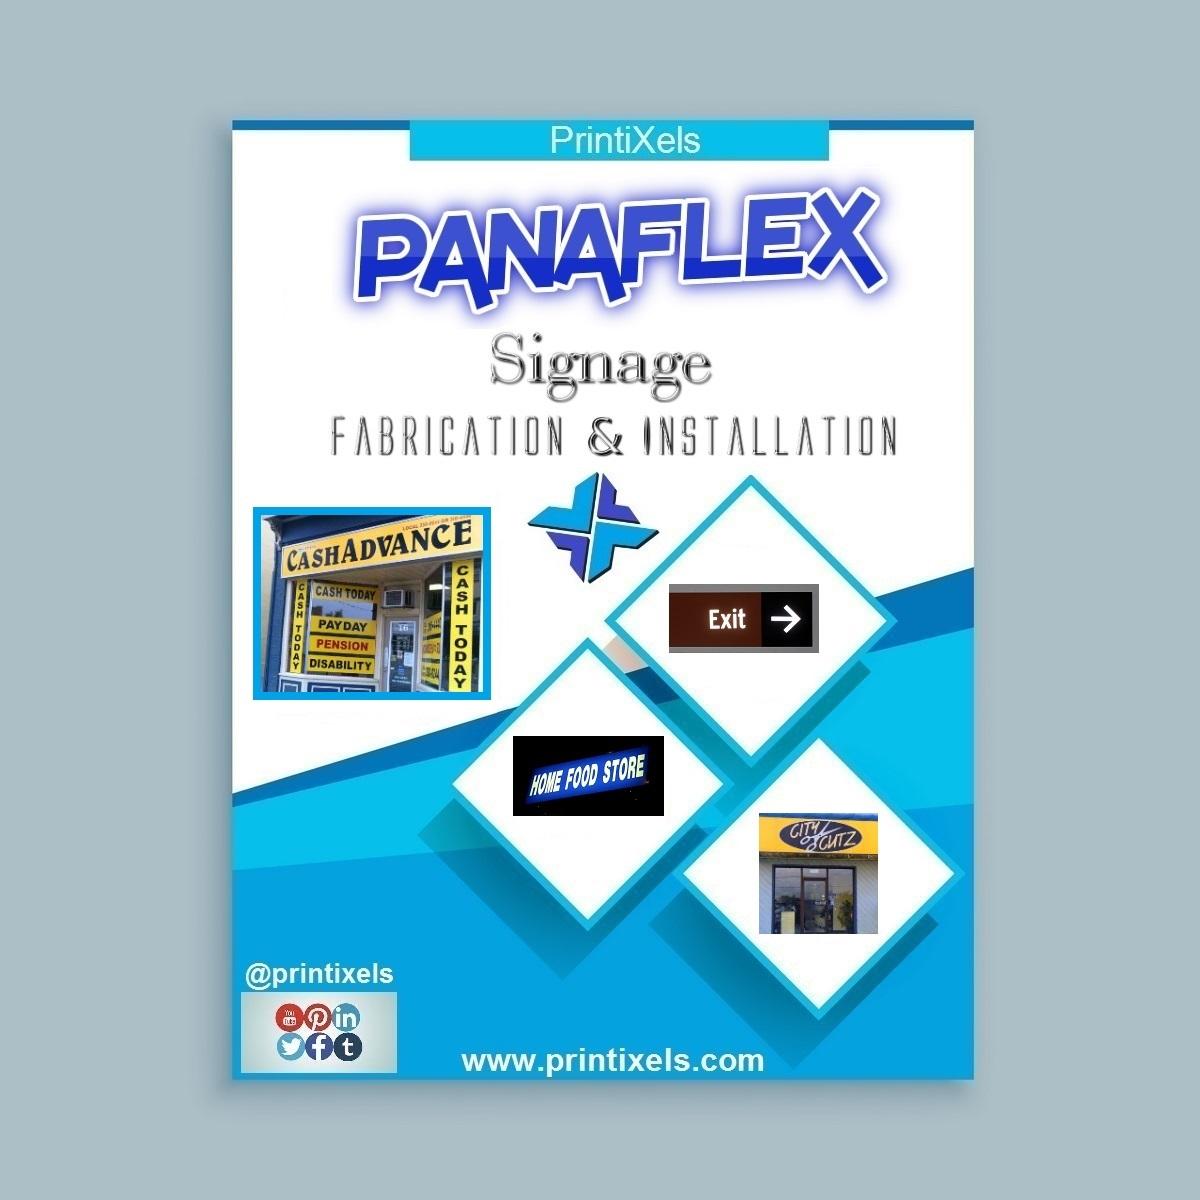 Panaflex Signage Fabrication & Installation